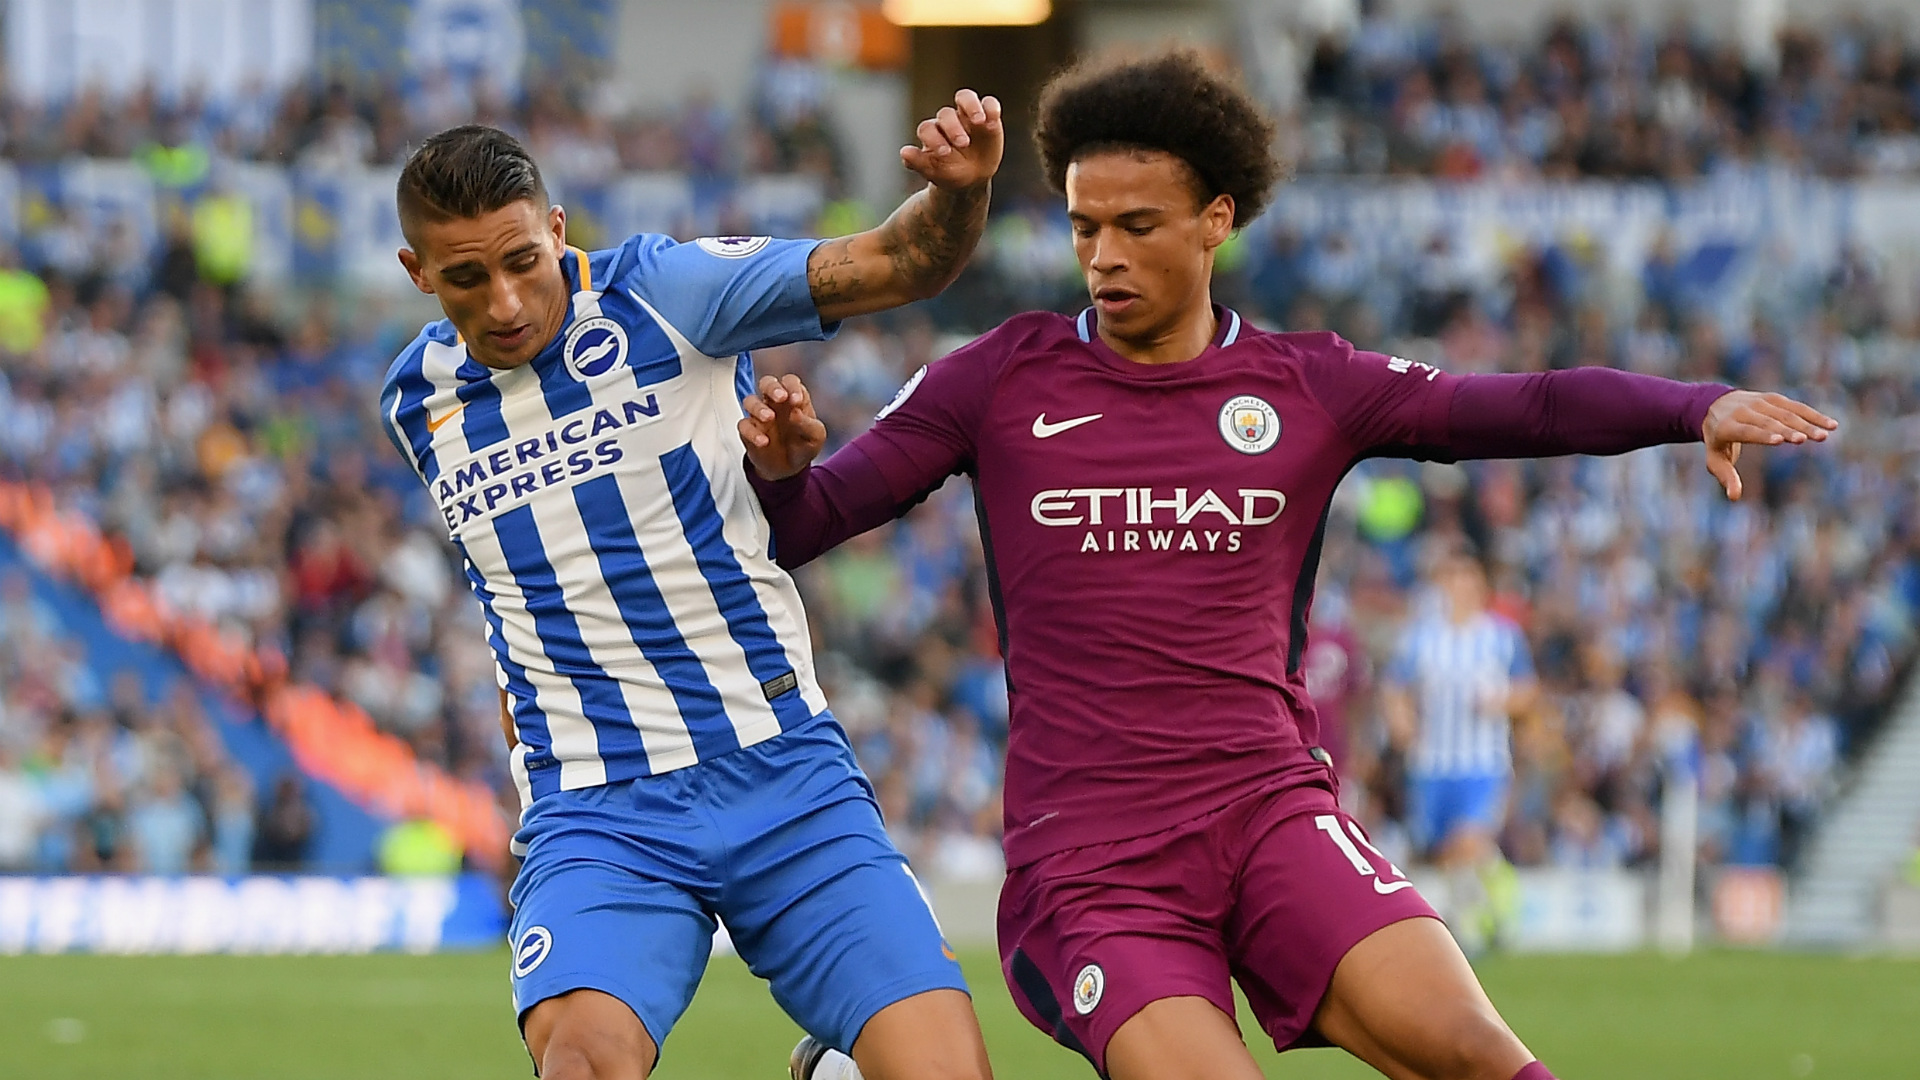 Manchester City Brighton and Hove Albion